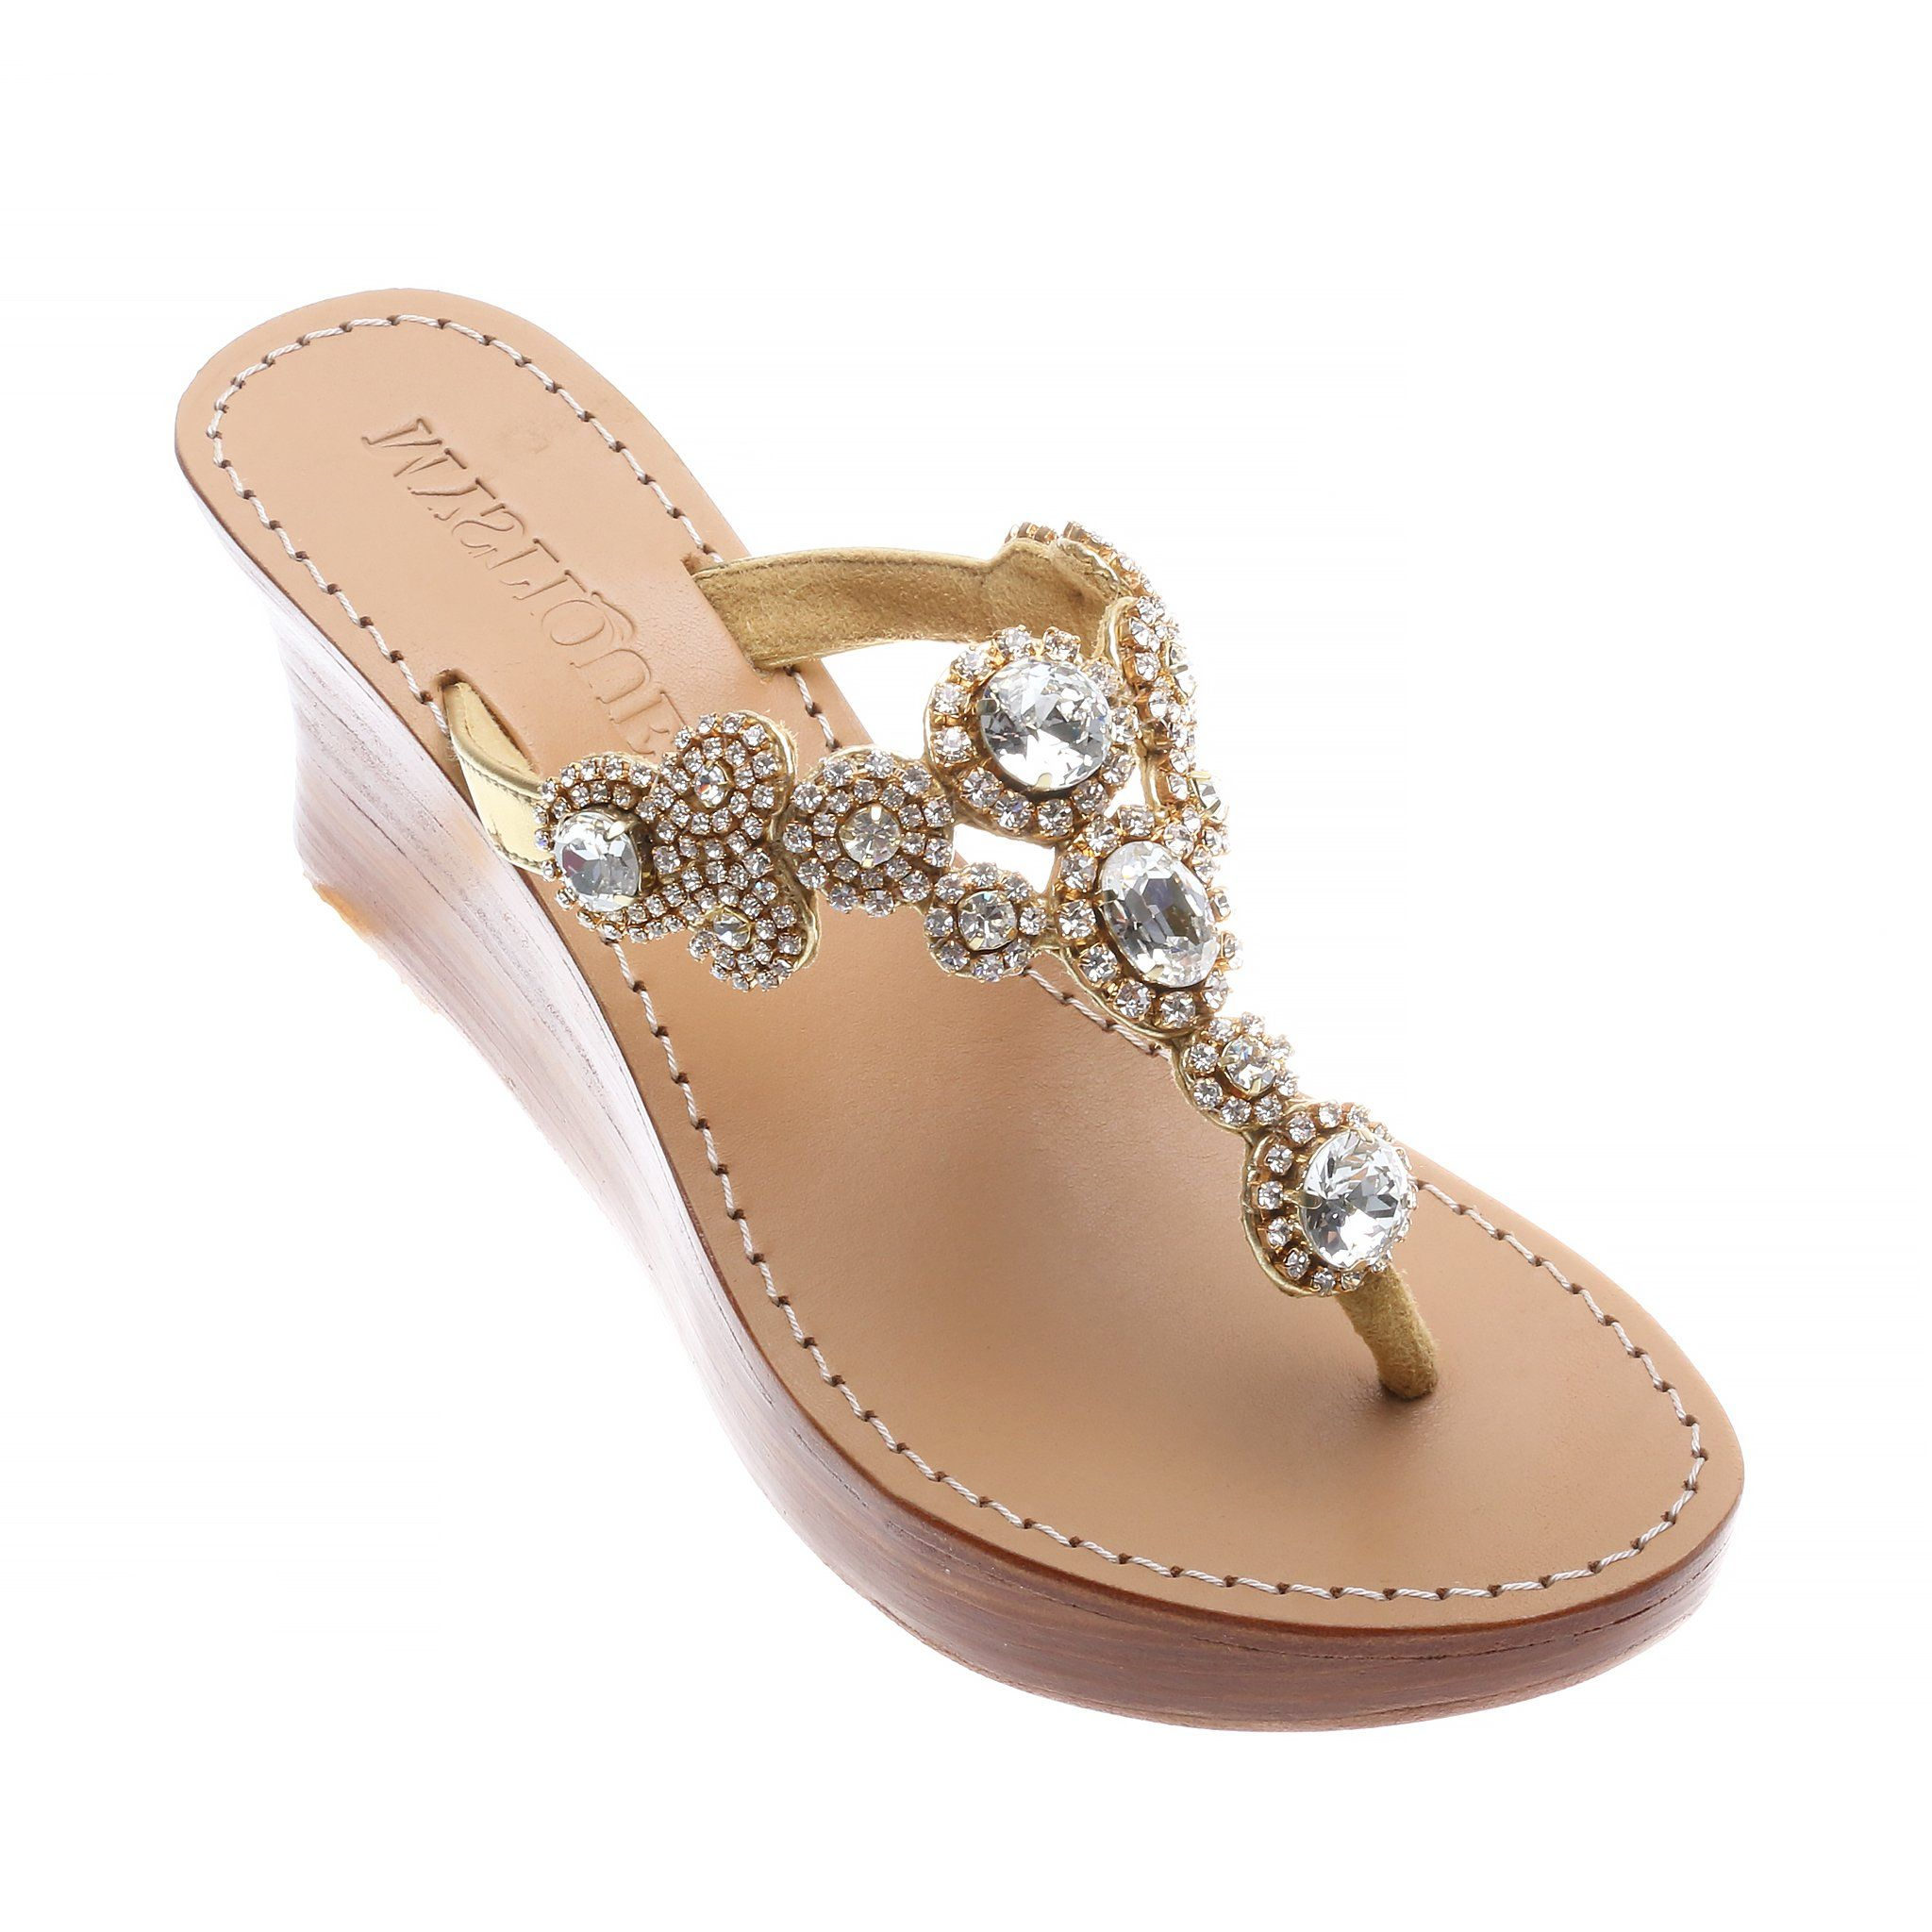 3eba8a511 Bellevue - Women s Gold Jeweled Wedge Sandals